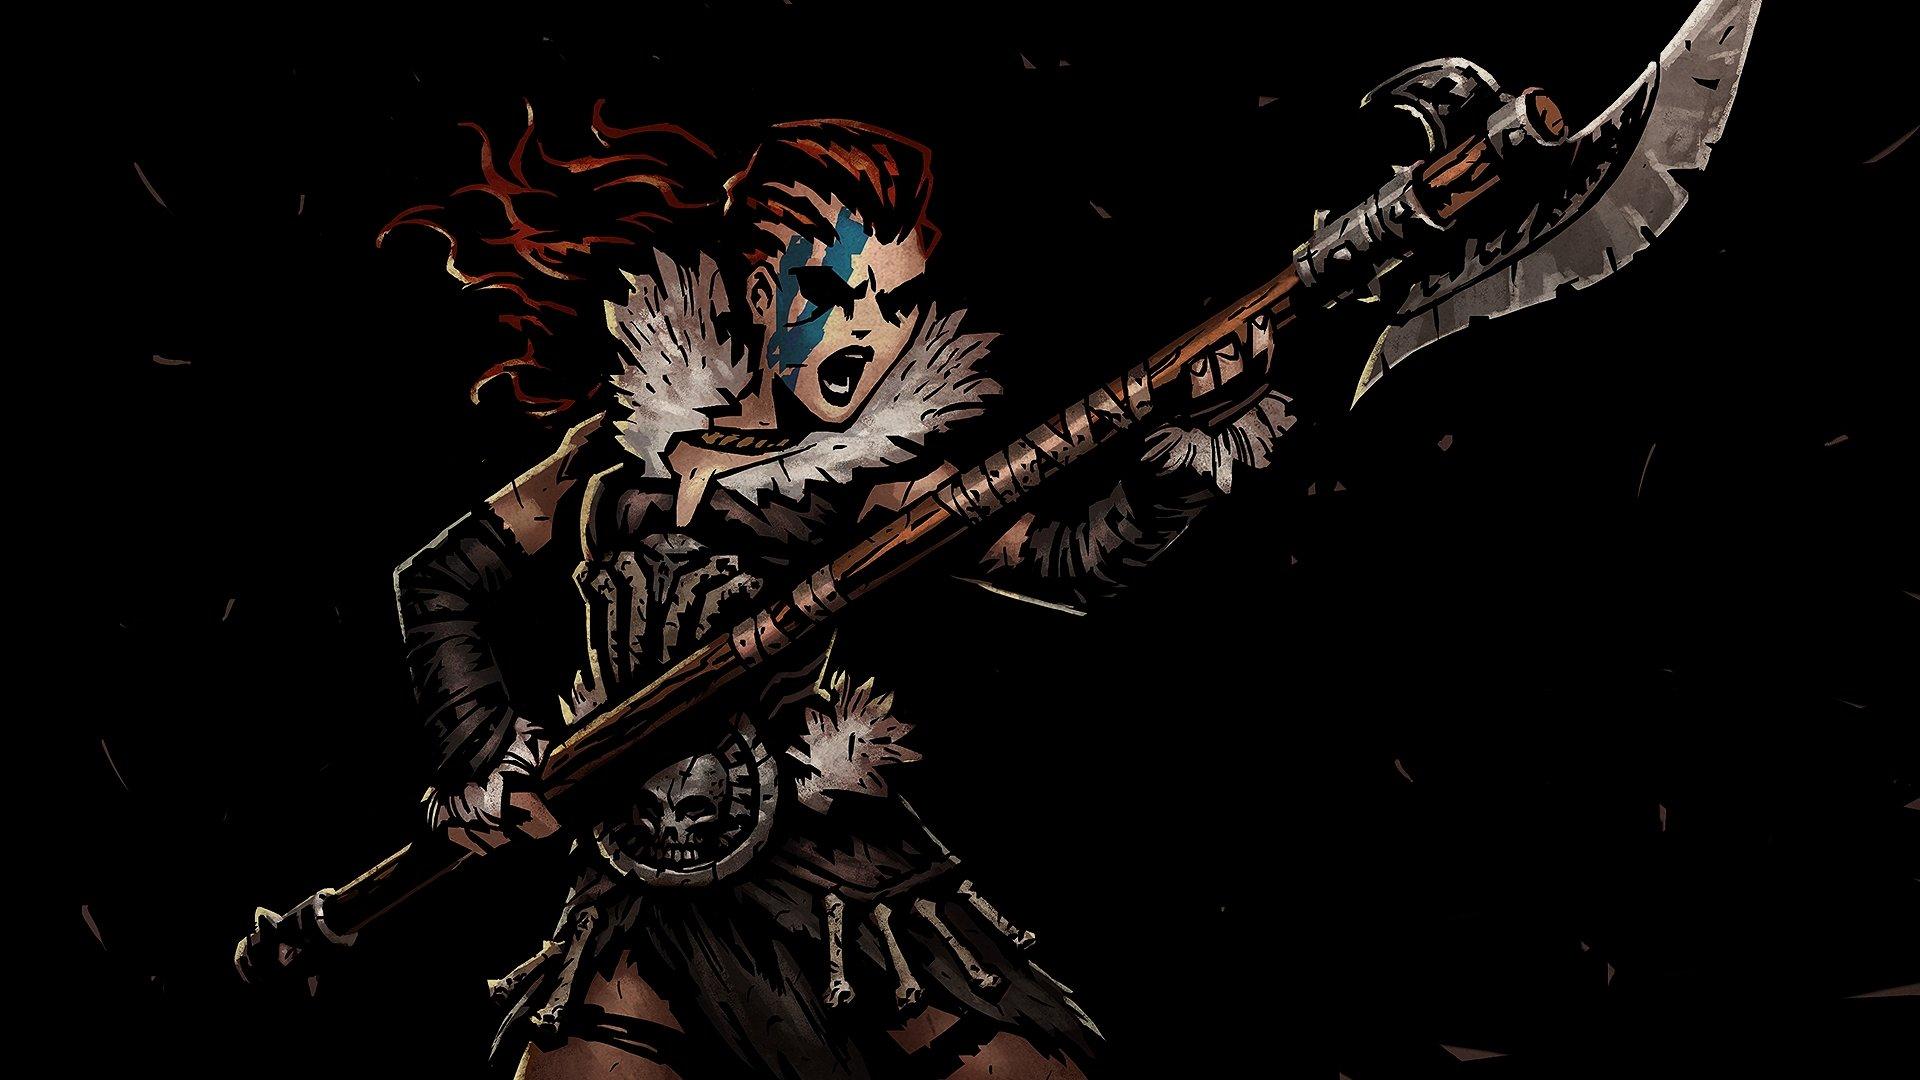 Darkest Dungeon wallpapers 1920x1080 Full HD (1080p ...